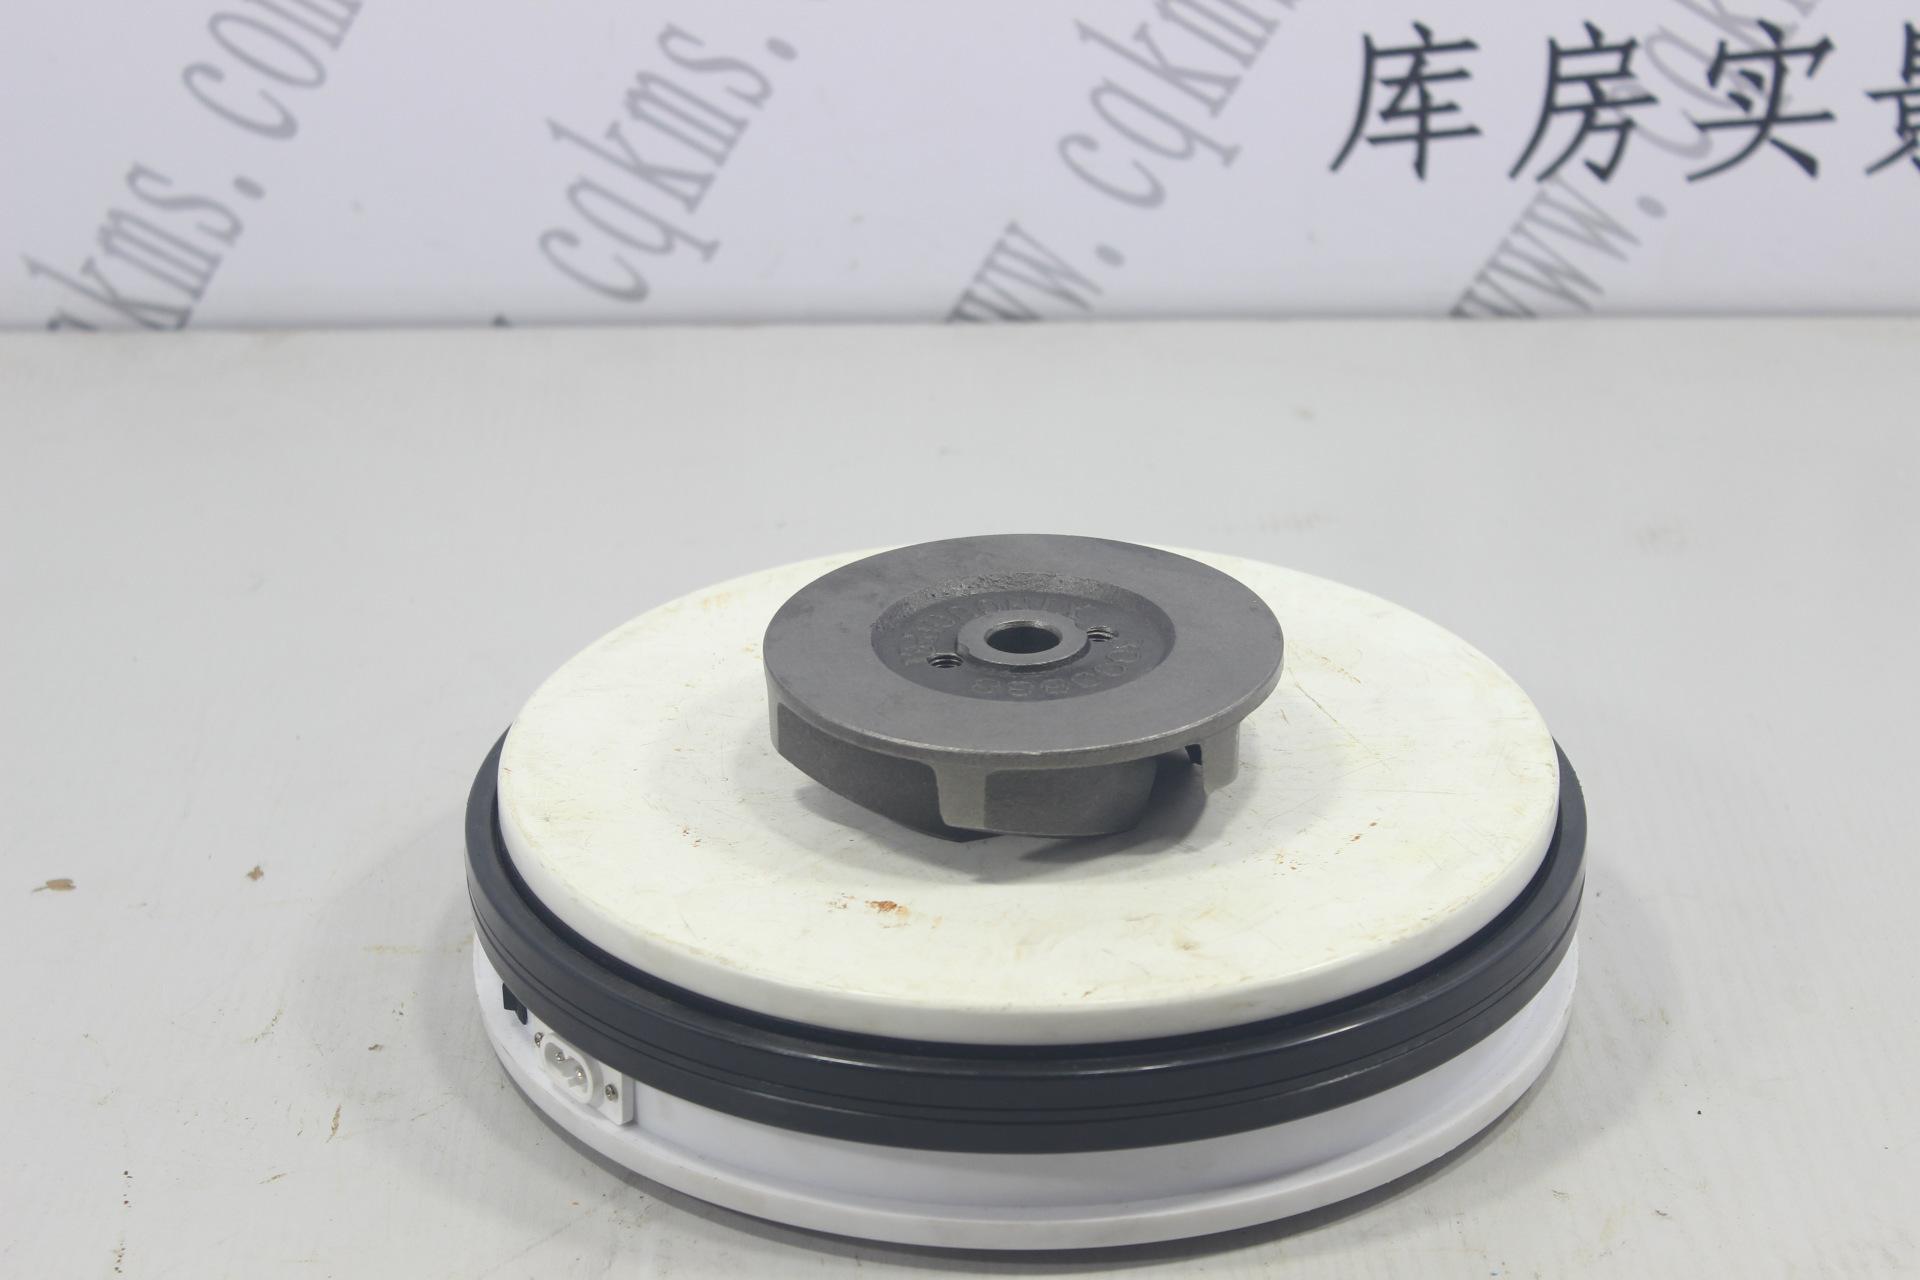 kms01748-3000888-叶轮---参考规格直径11.4cm,内径0.7cm,内径边孔0.8cm,高6.5cm-参考重量850-850图片1